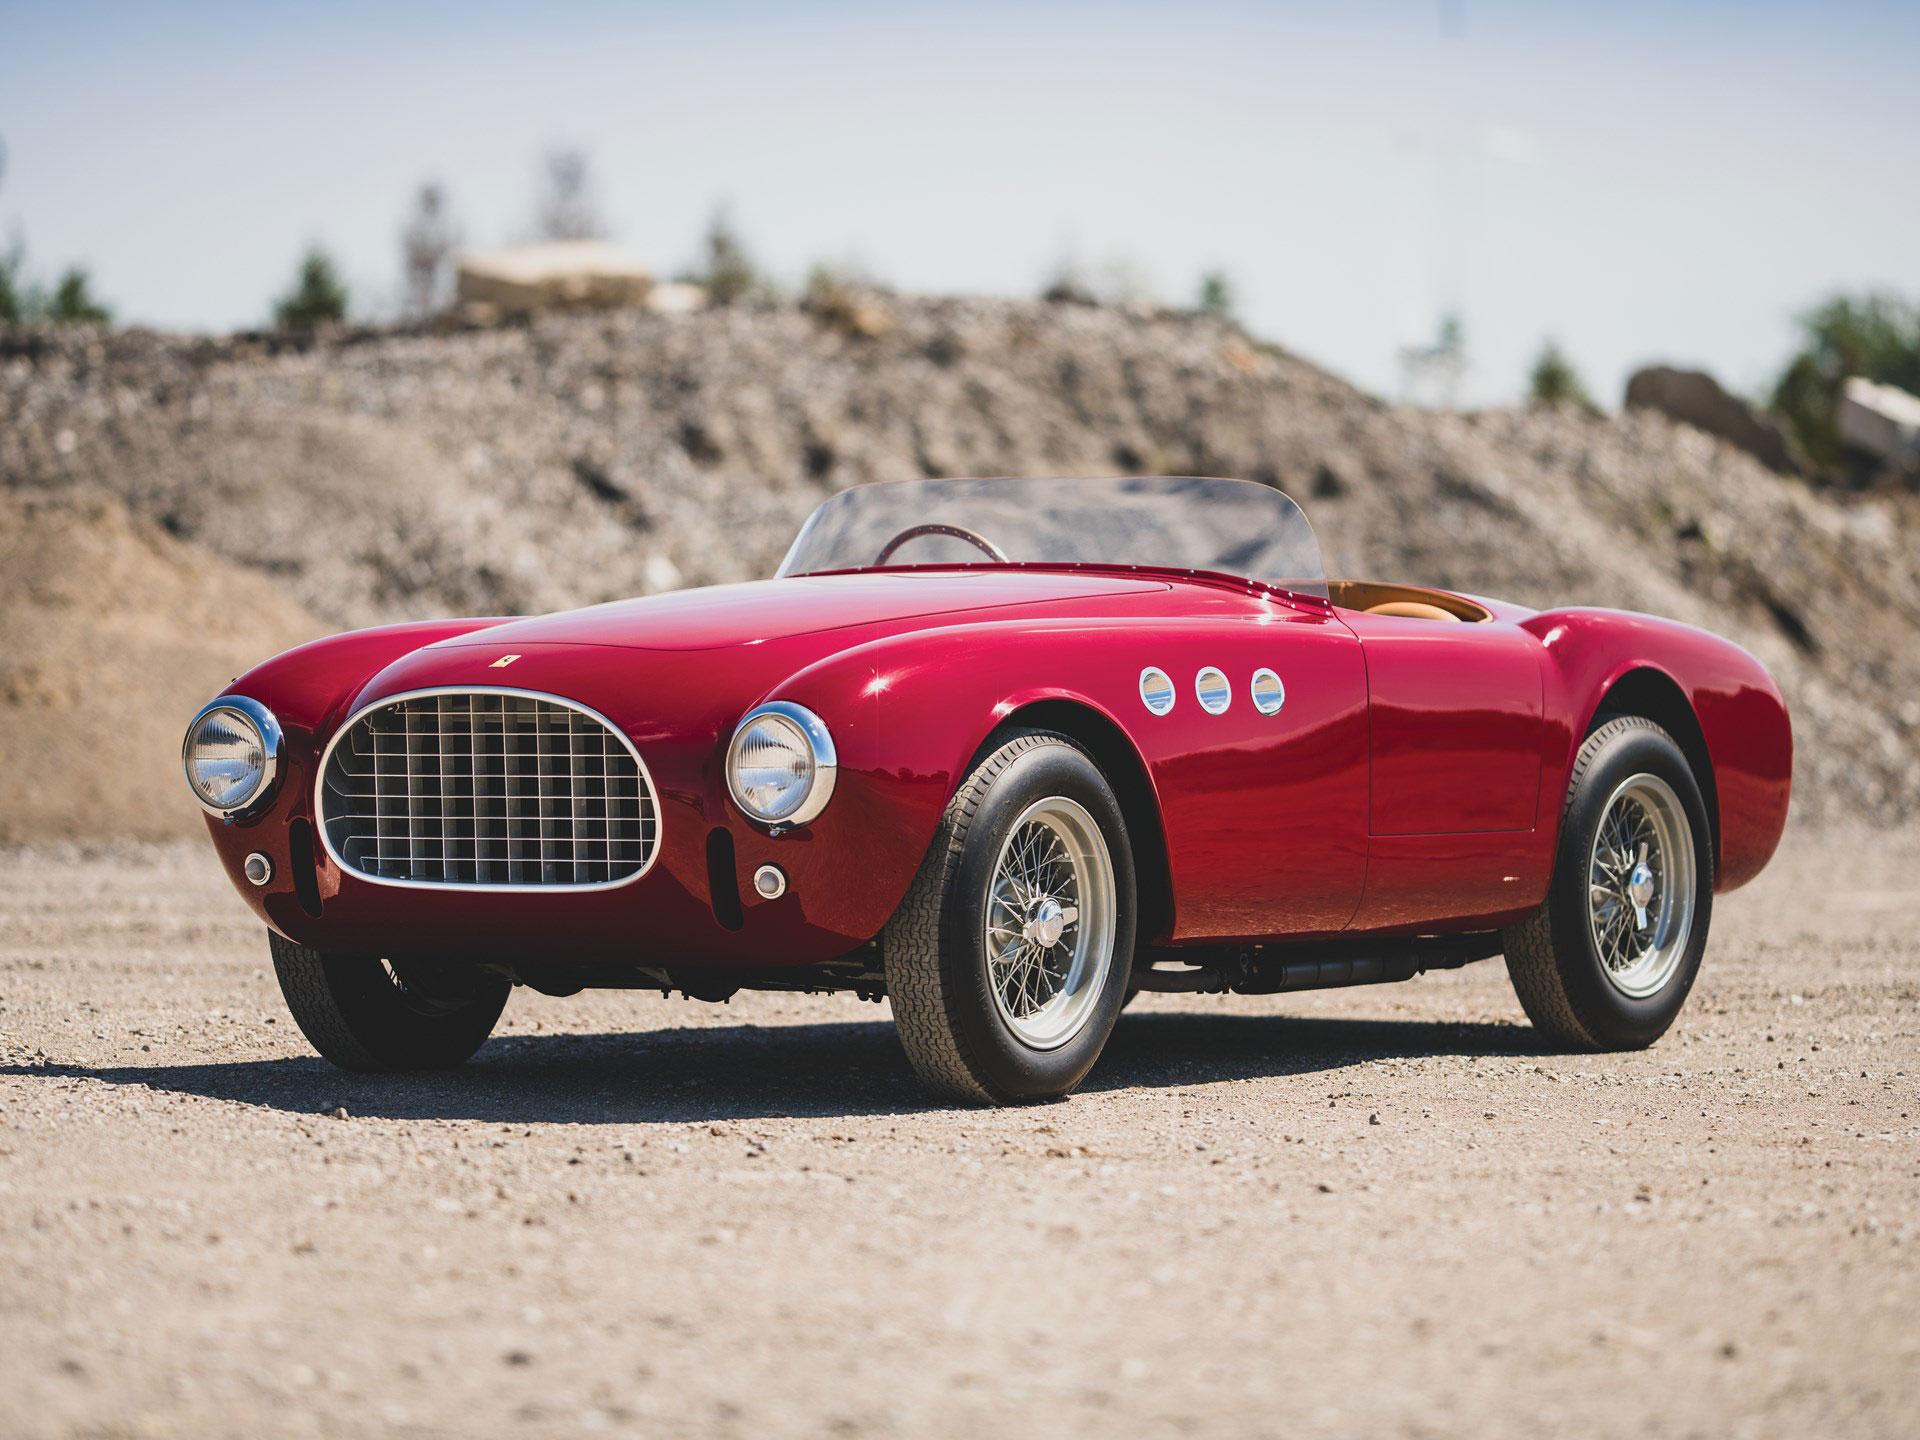 1952 Ferrari 225 Sport Spider